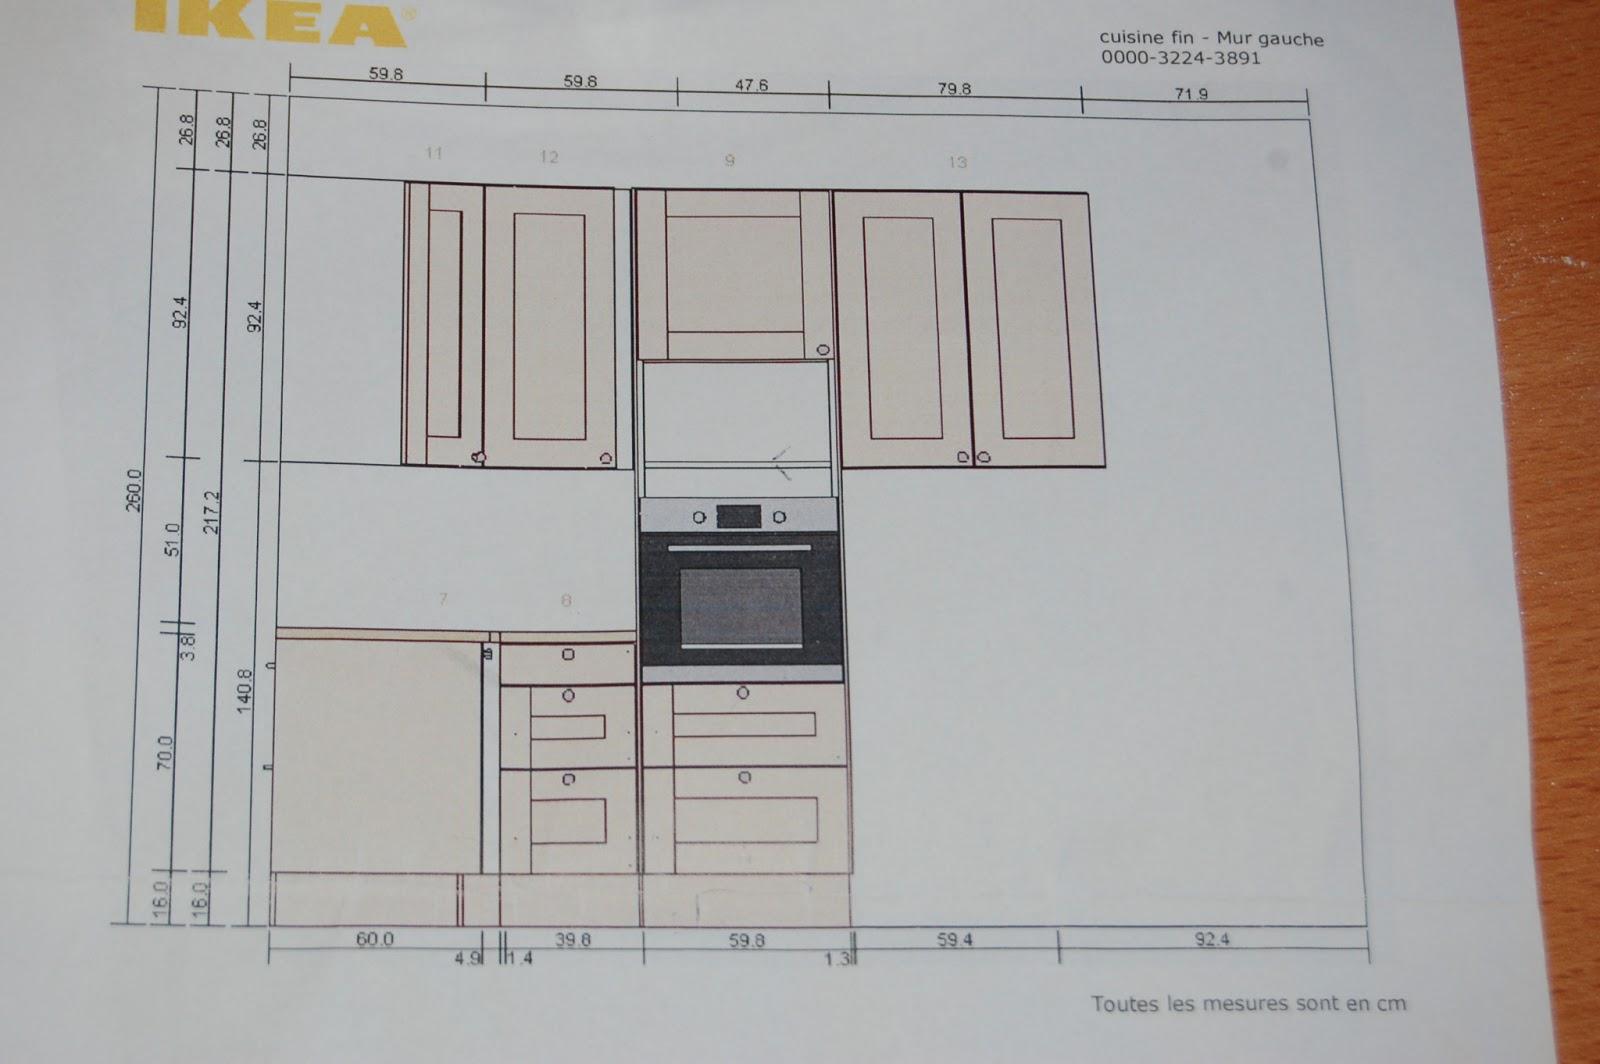 Ikea meuble haut cuisine metod wall cab horizontal w glass Meuble colonne cuisine porte coulissant ikea metod